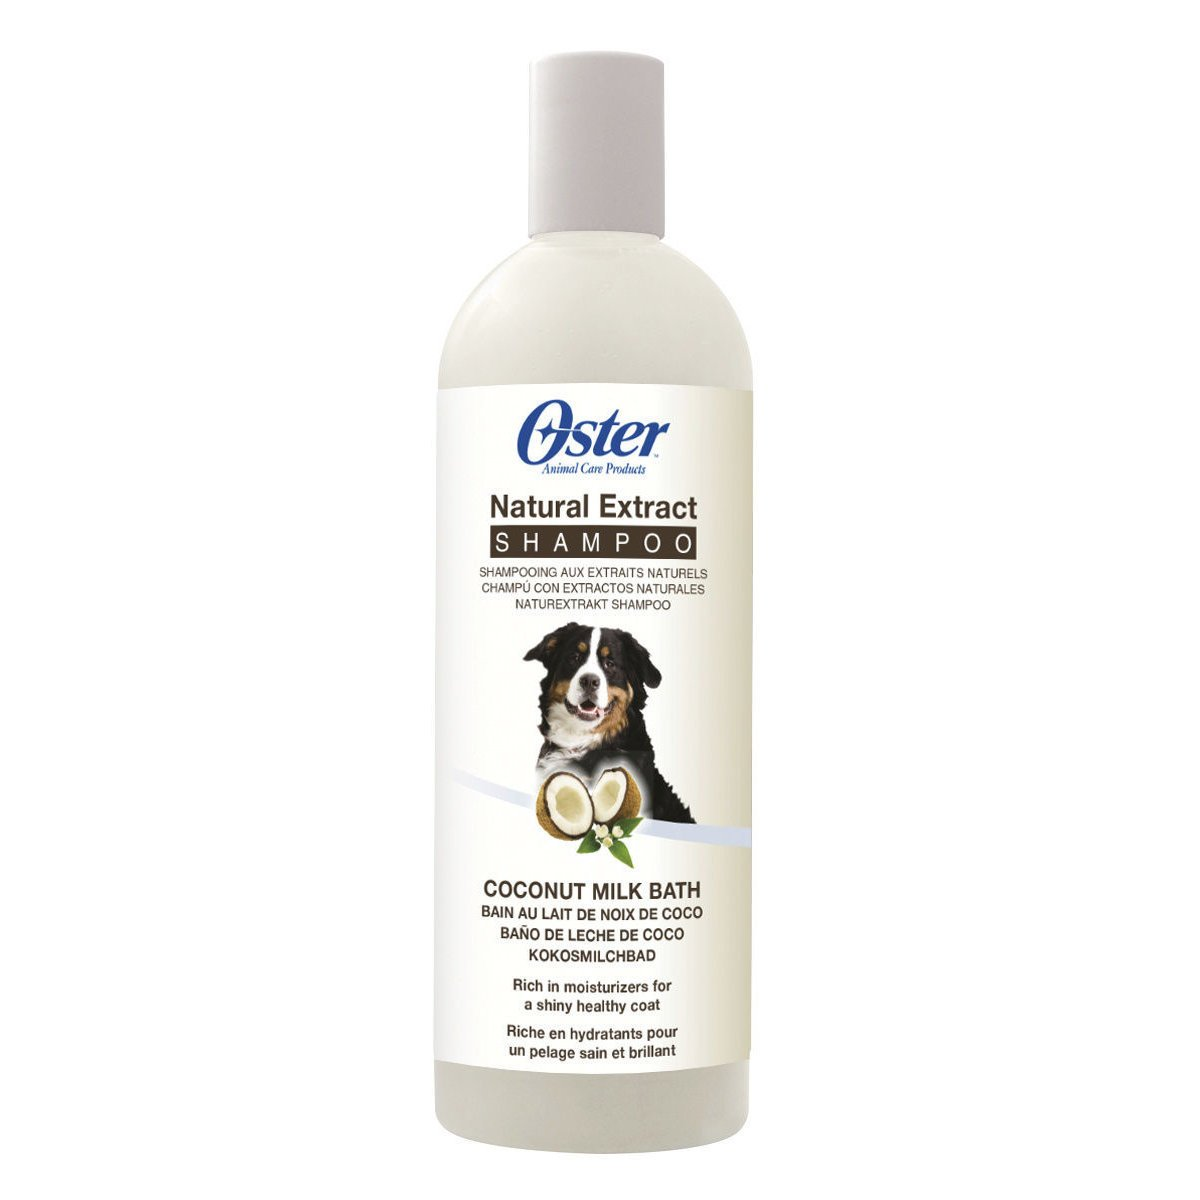 Oster Natural Extract Premium Hundeshampoo, Kokosmilchbad Shampoo 473 ml